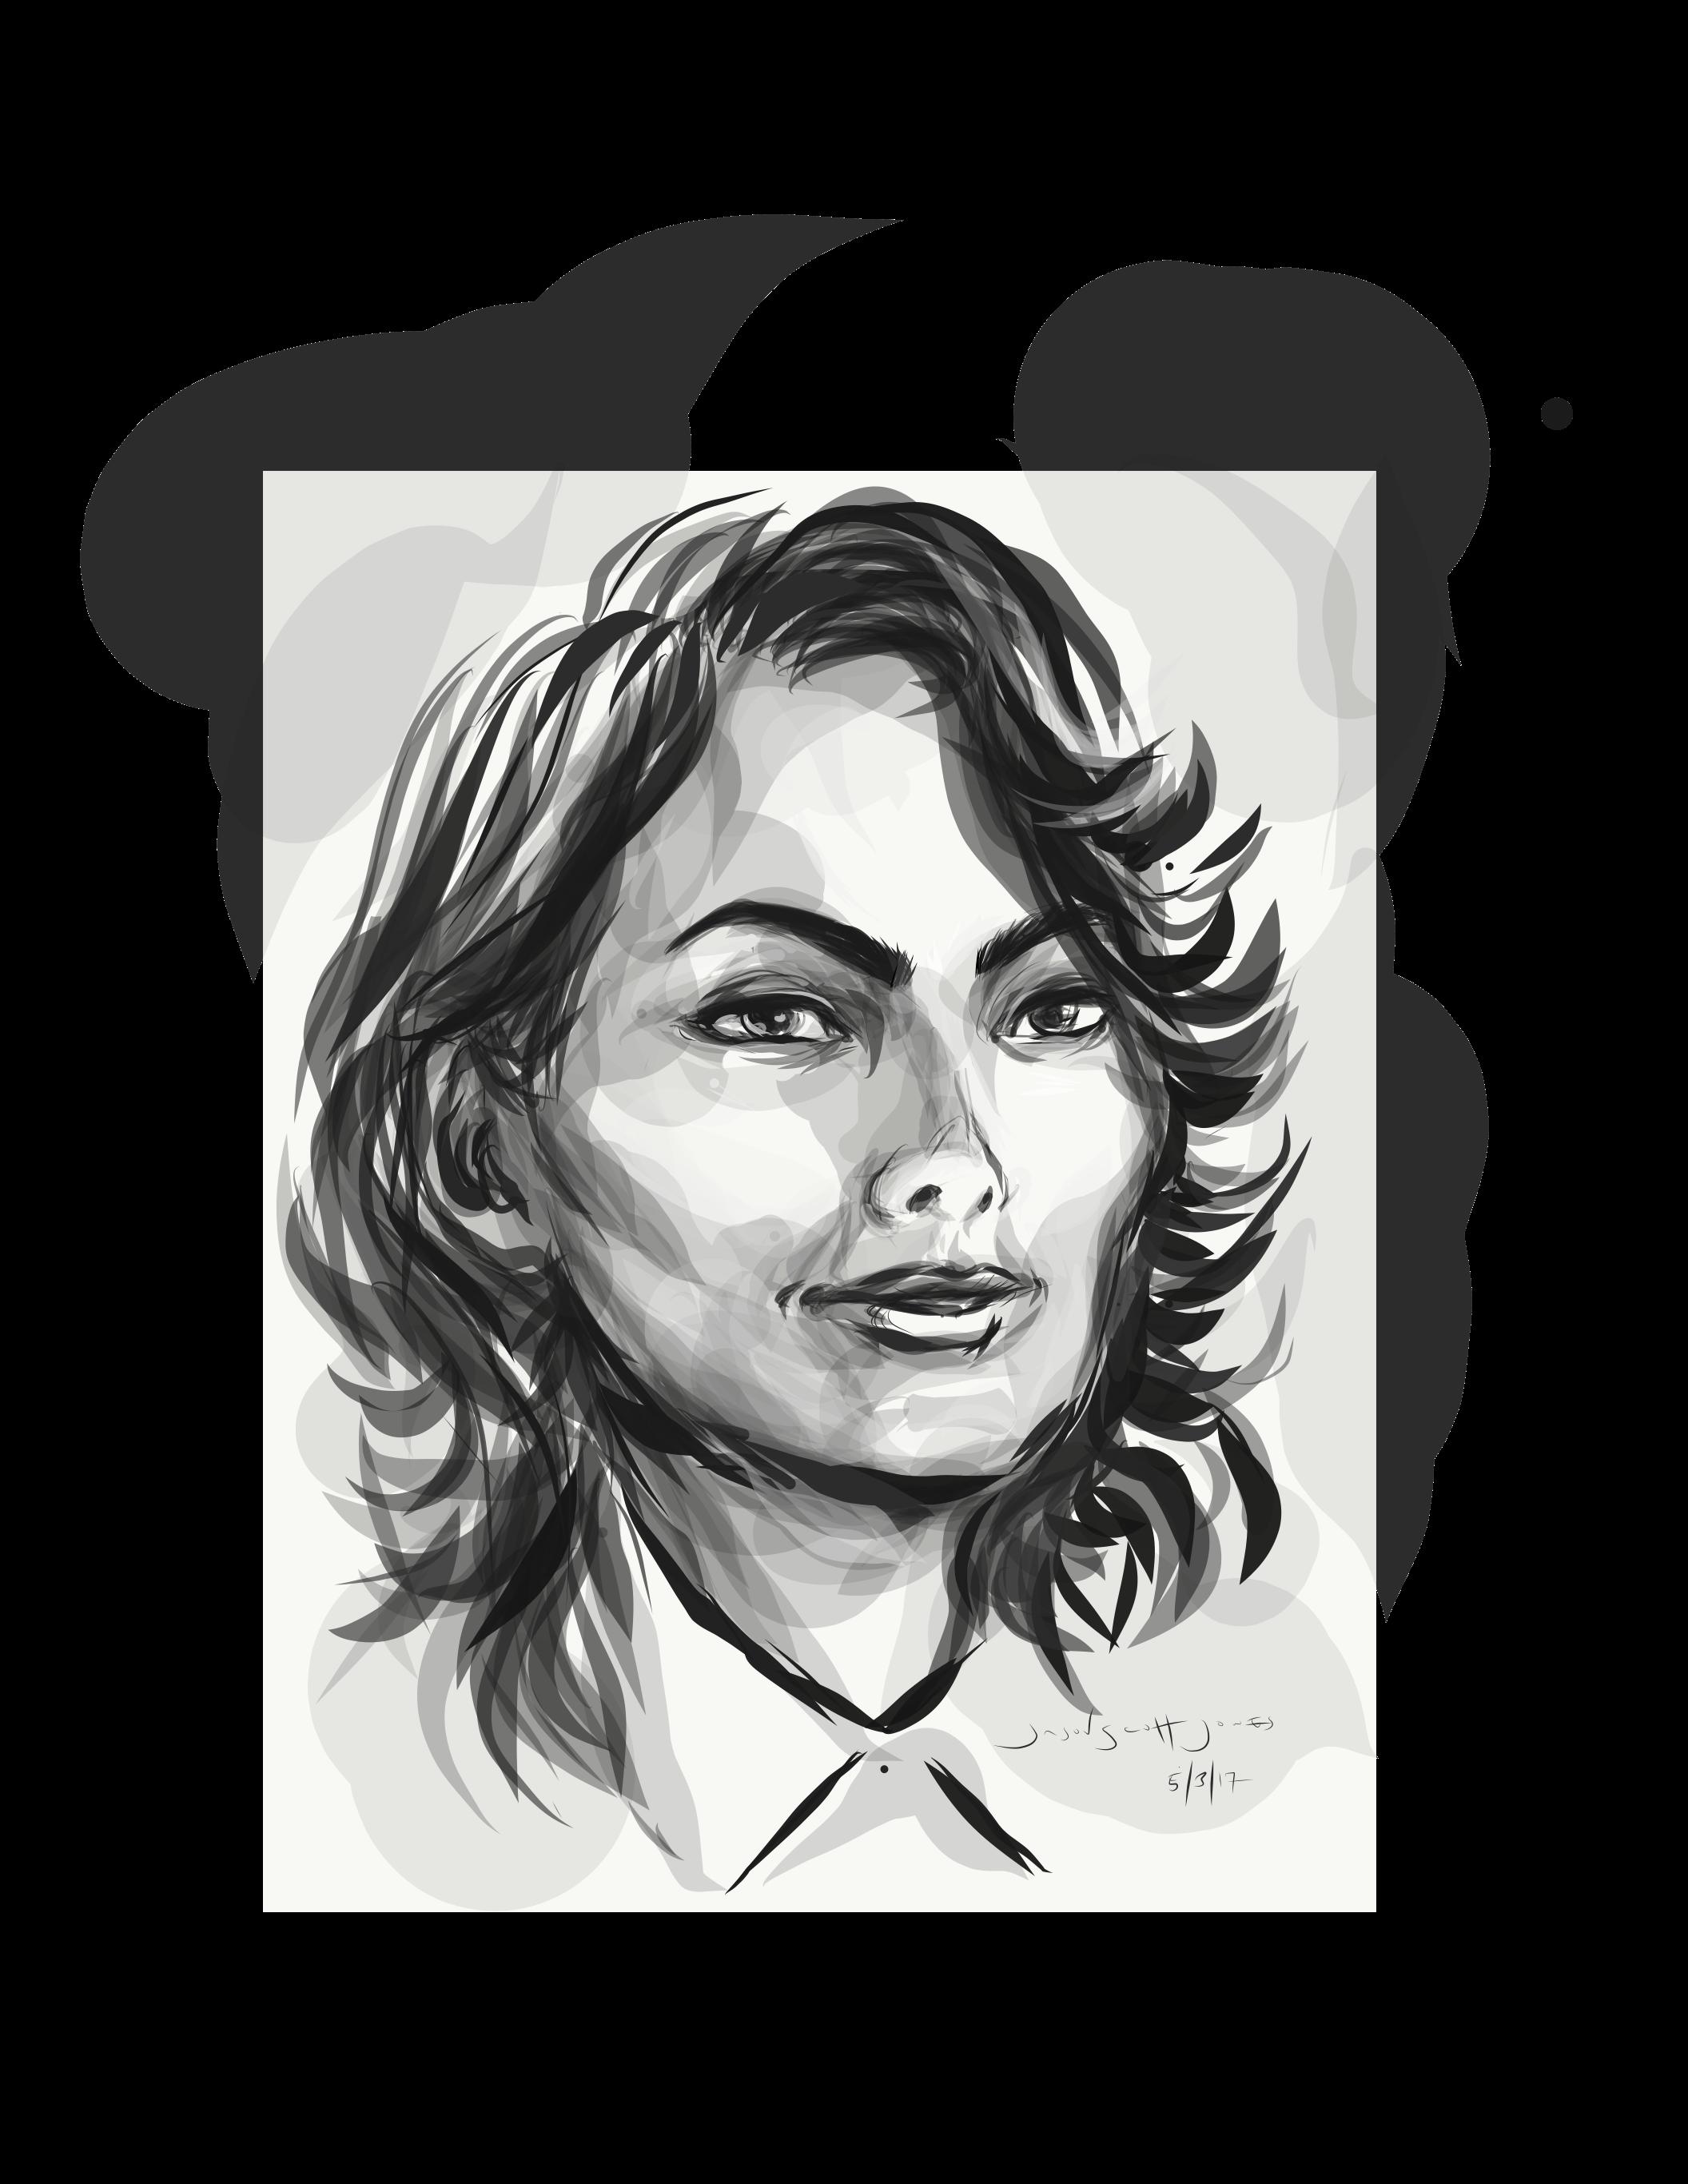 image transparent stock Drawing portrait illustration. Adobe draw made of